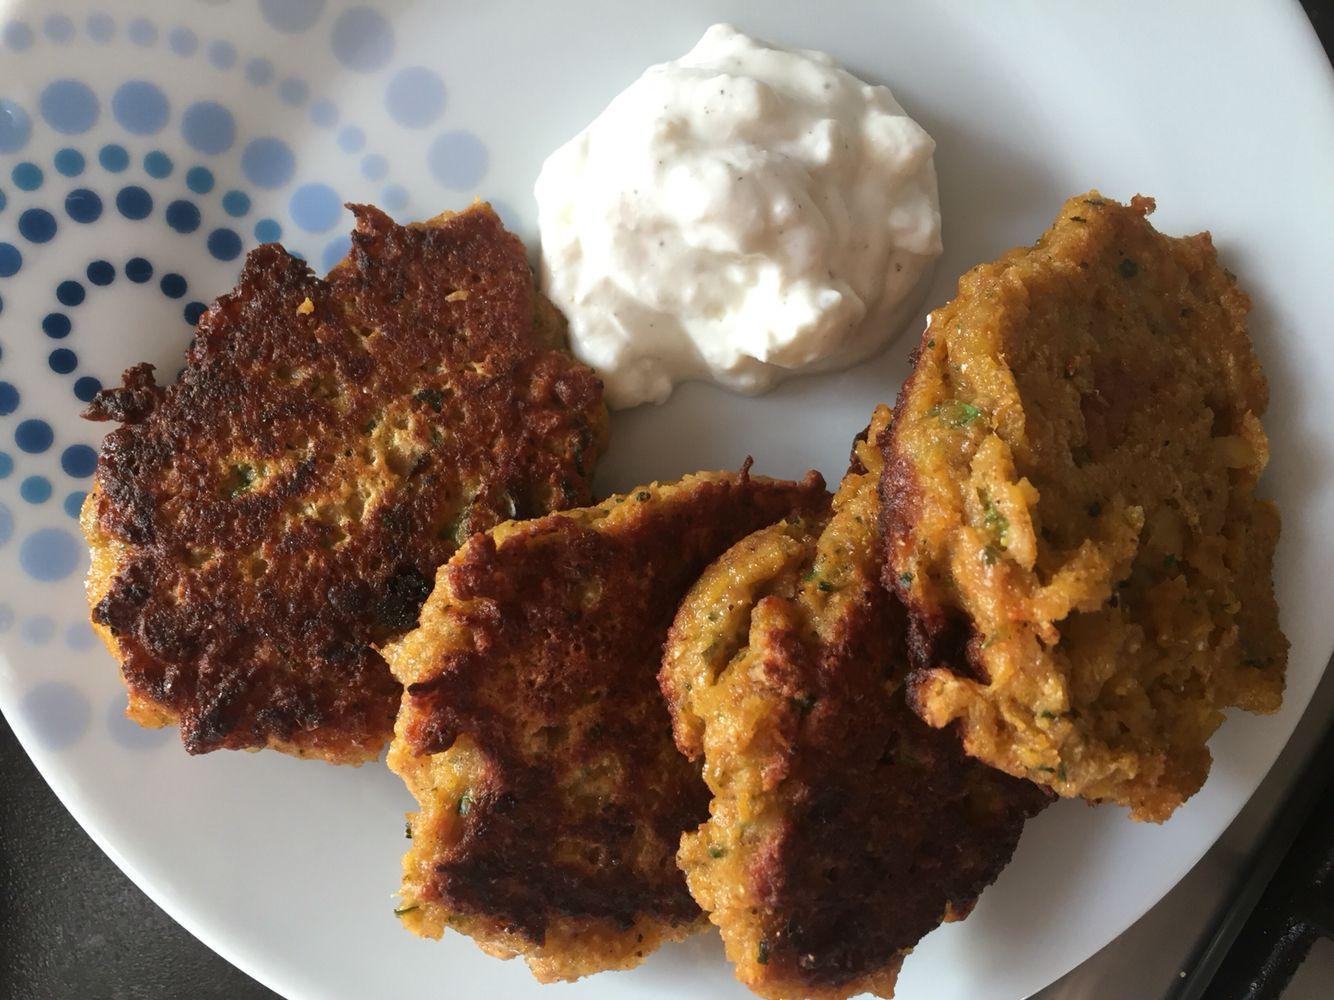 Sweet potatoe patties with garlic - yogurt dip